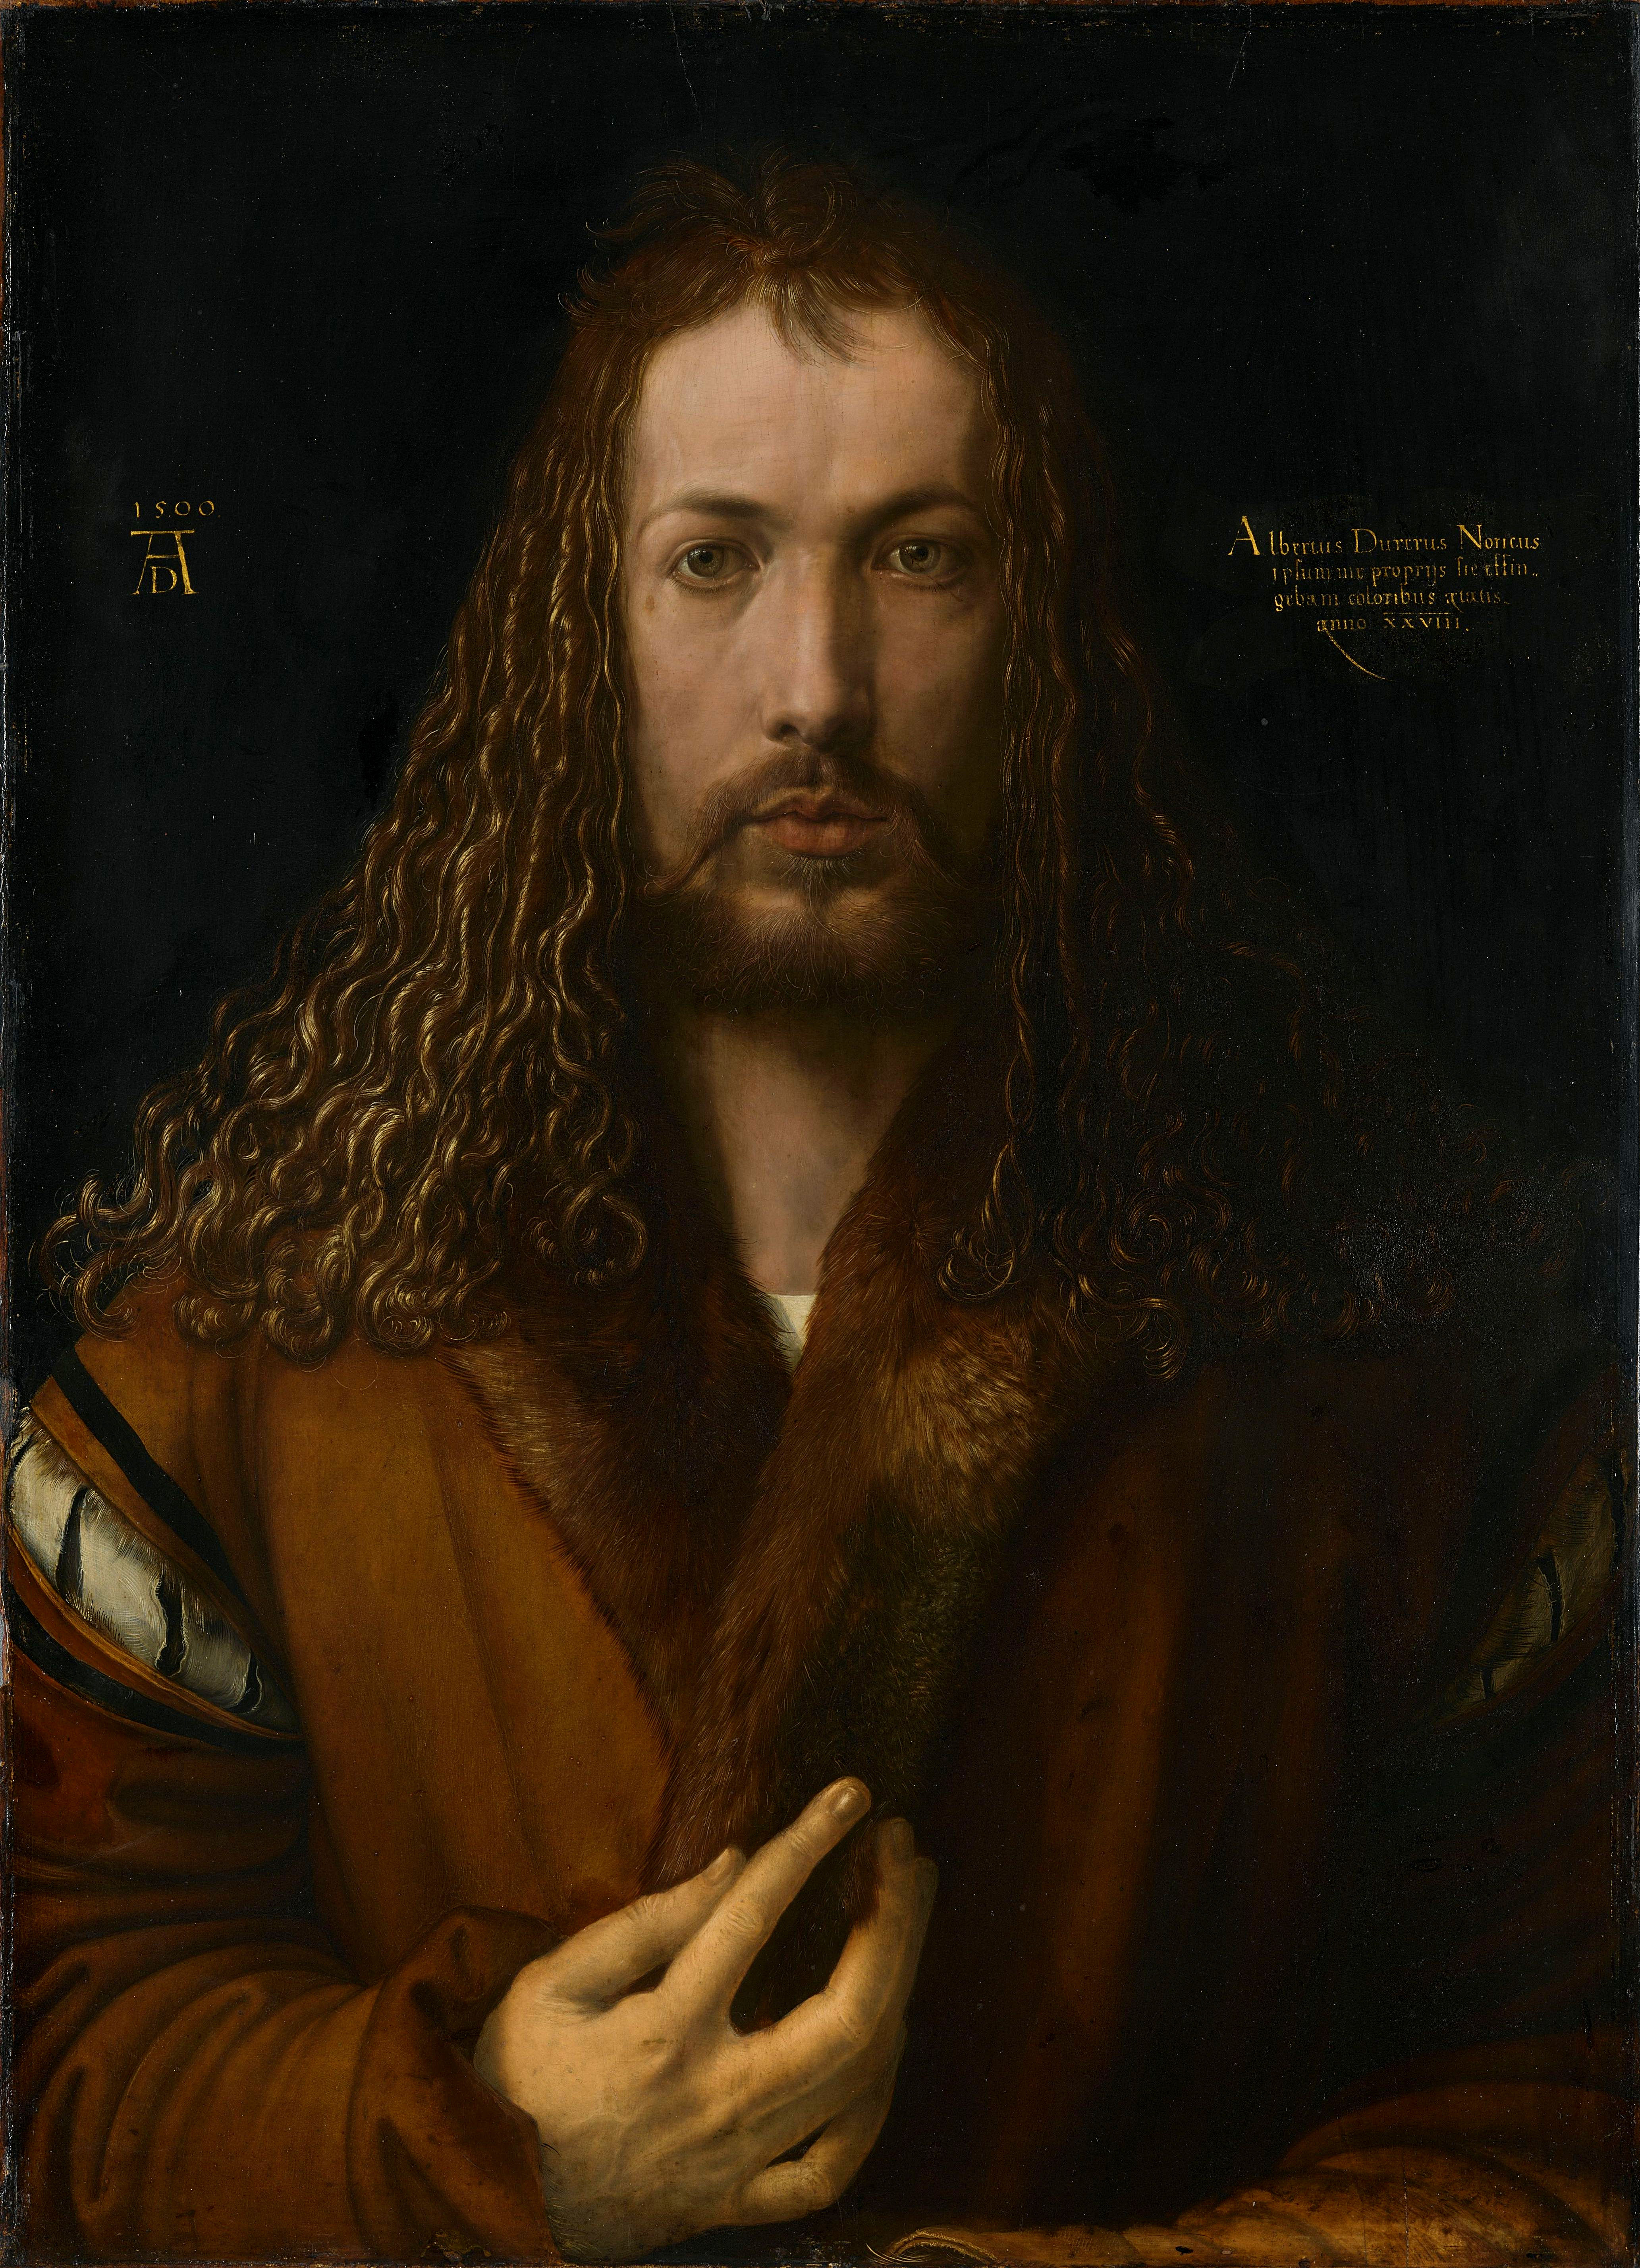 ''[[Self-Portrait (Dürer, Munich)|Self-Portrait at 28]]'', 1500